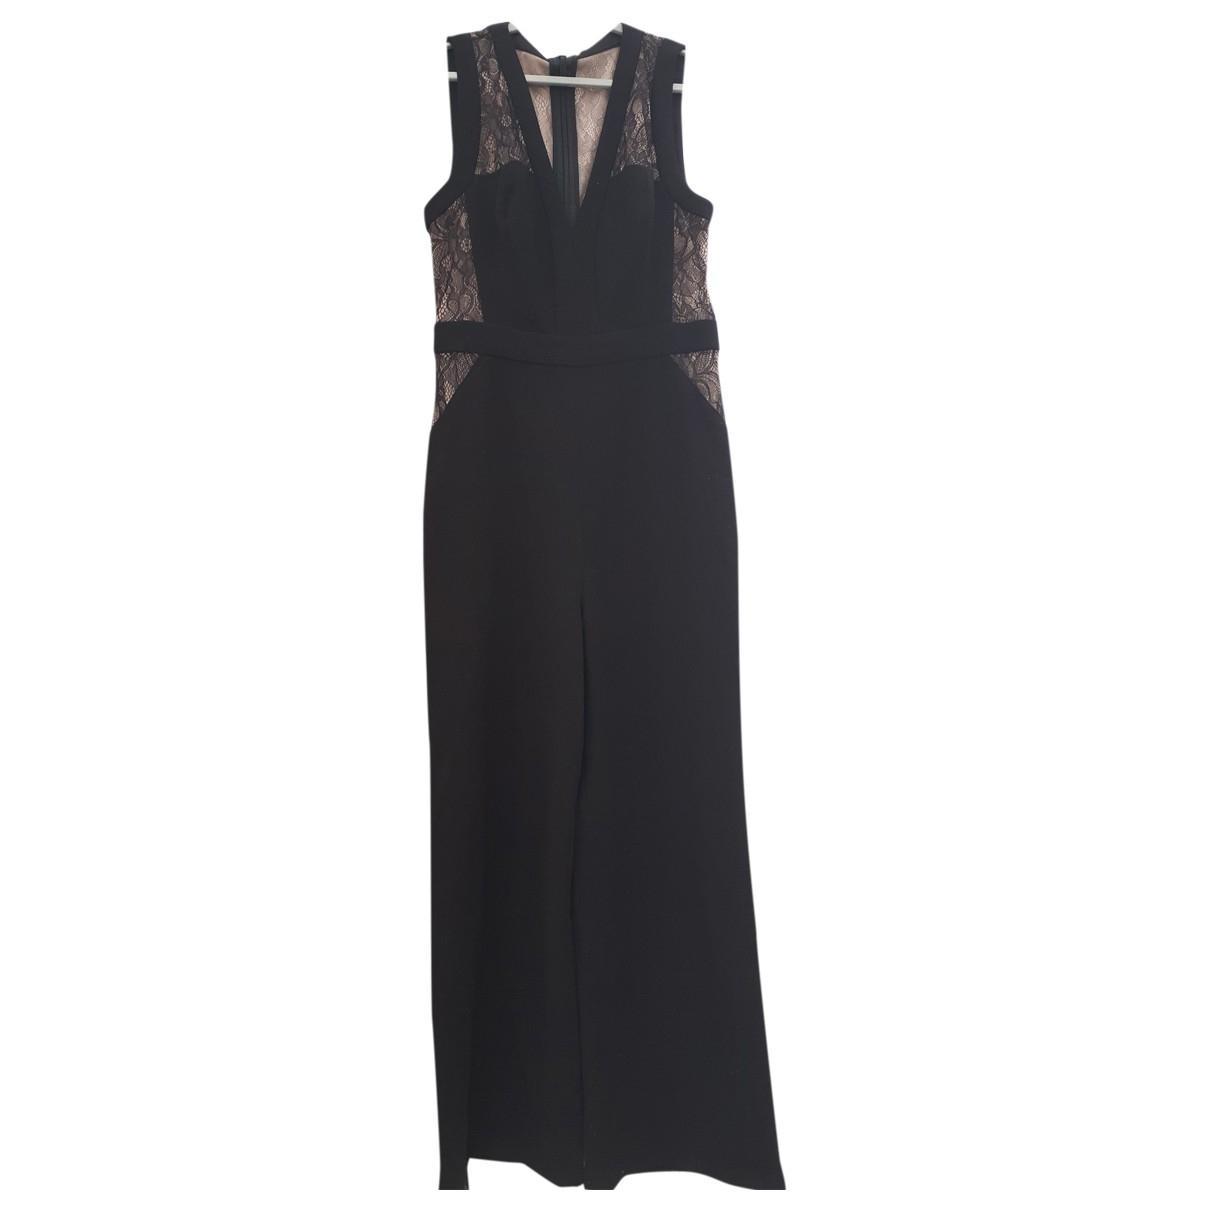 Bcbg Max Azria \N Black jumpsuit for Women 40 FR